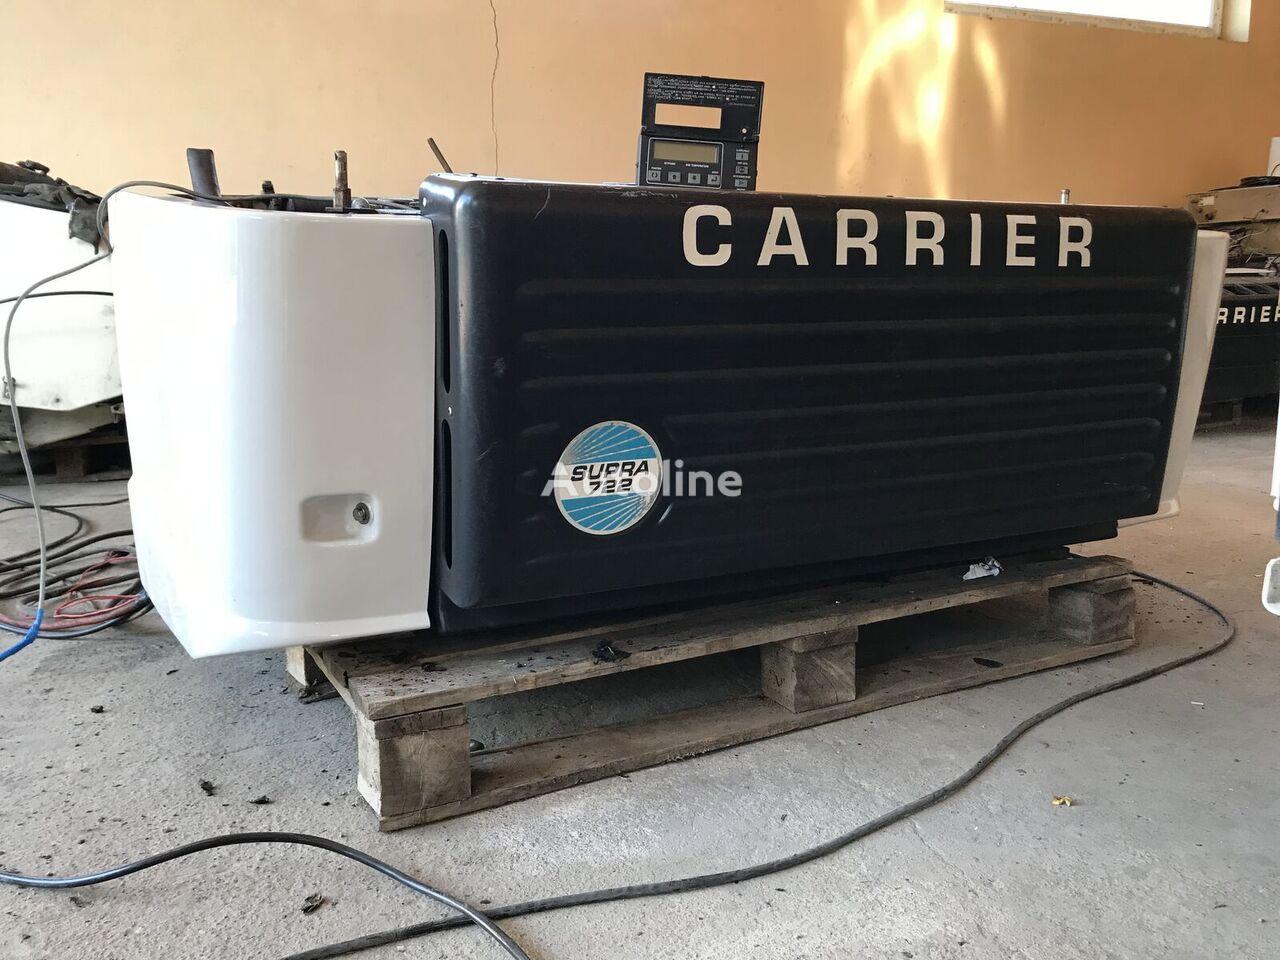 CARRIER - SUPRA 722 refrigeration unit